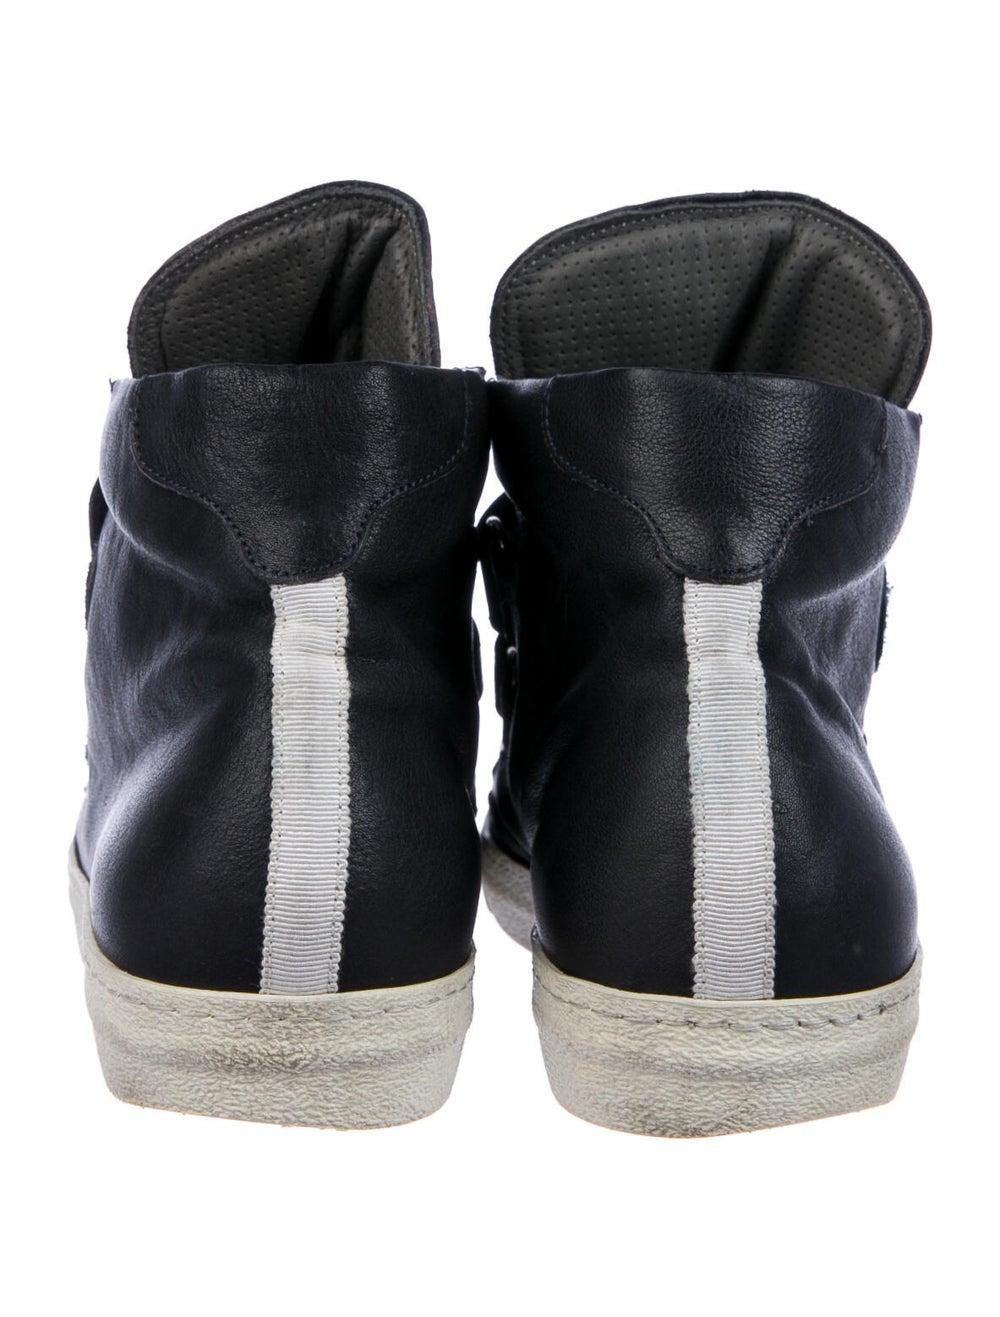 Alexander McQueen Leather Sneakers Blue - image 4